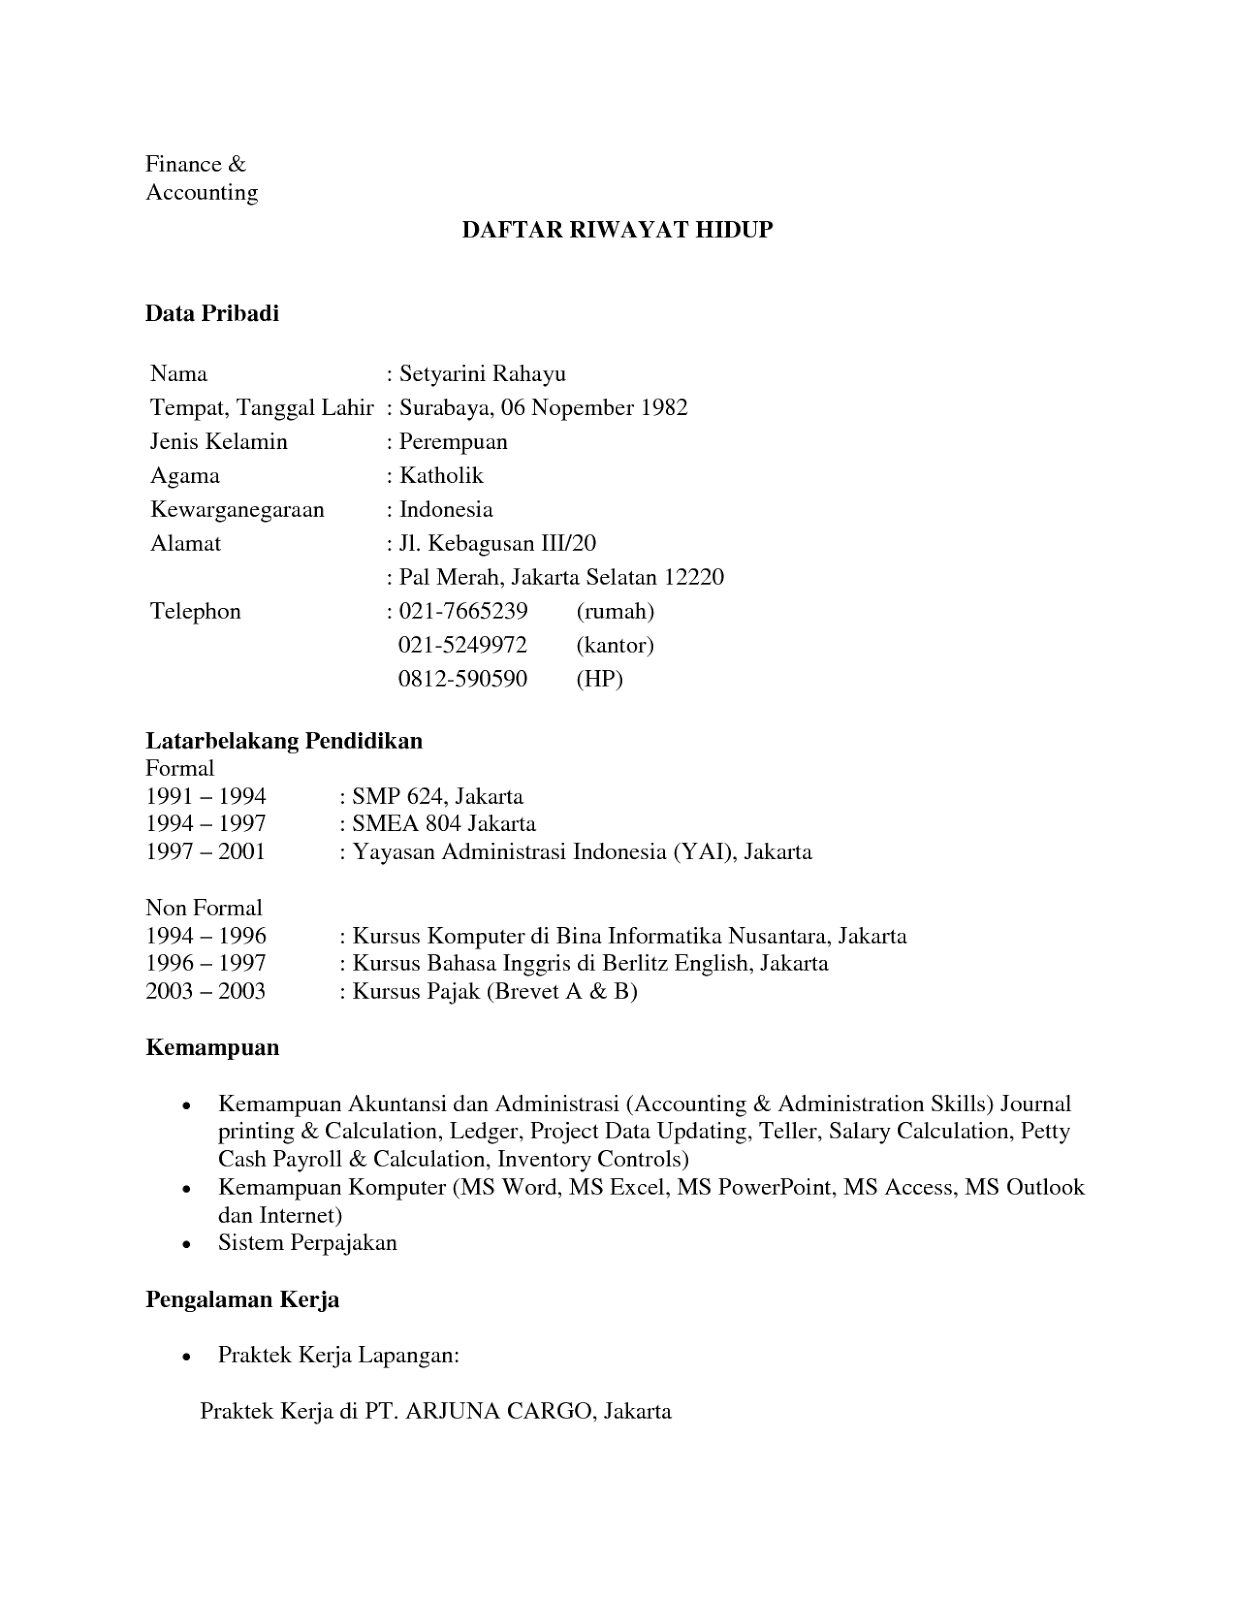 Contoh Daftar Riwayat Hidup Doc Cv Nabila